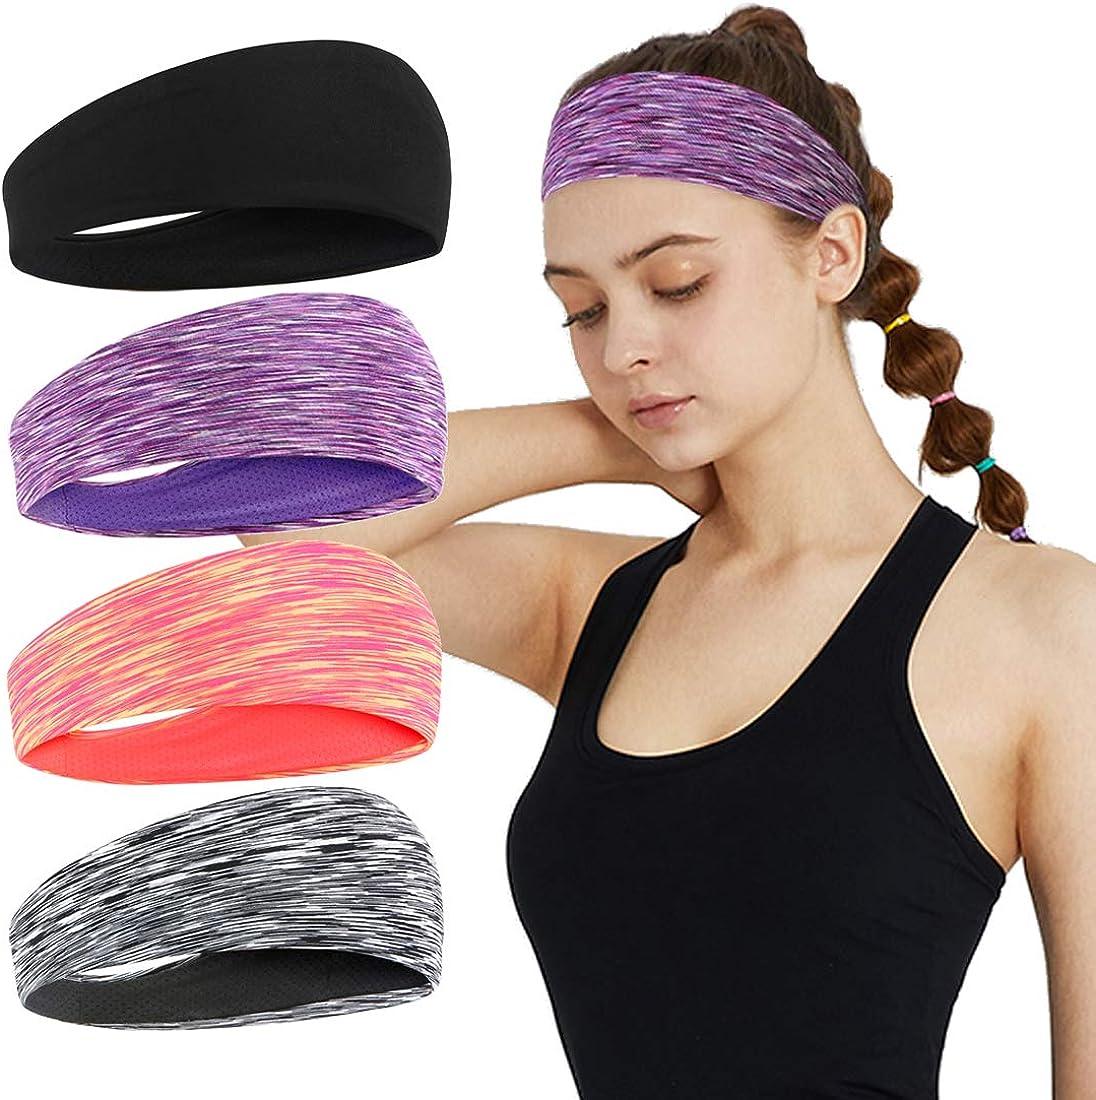 YONUF Workout Headbands for Women Non Slip Yoga Sports Stretchy Absorb Sweat Hairband Elastic Running Sweatband